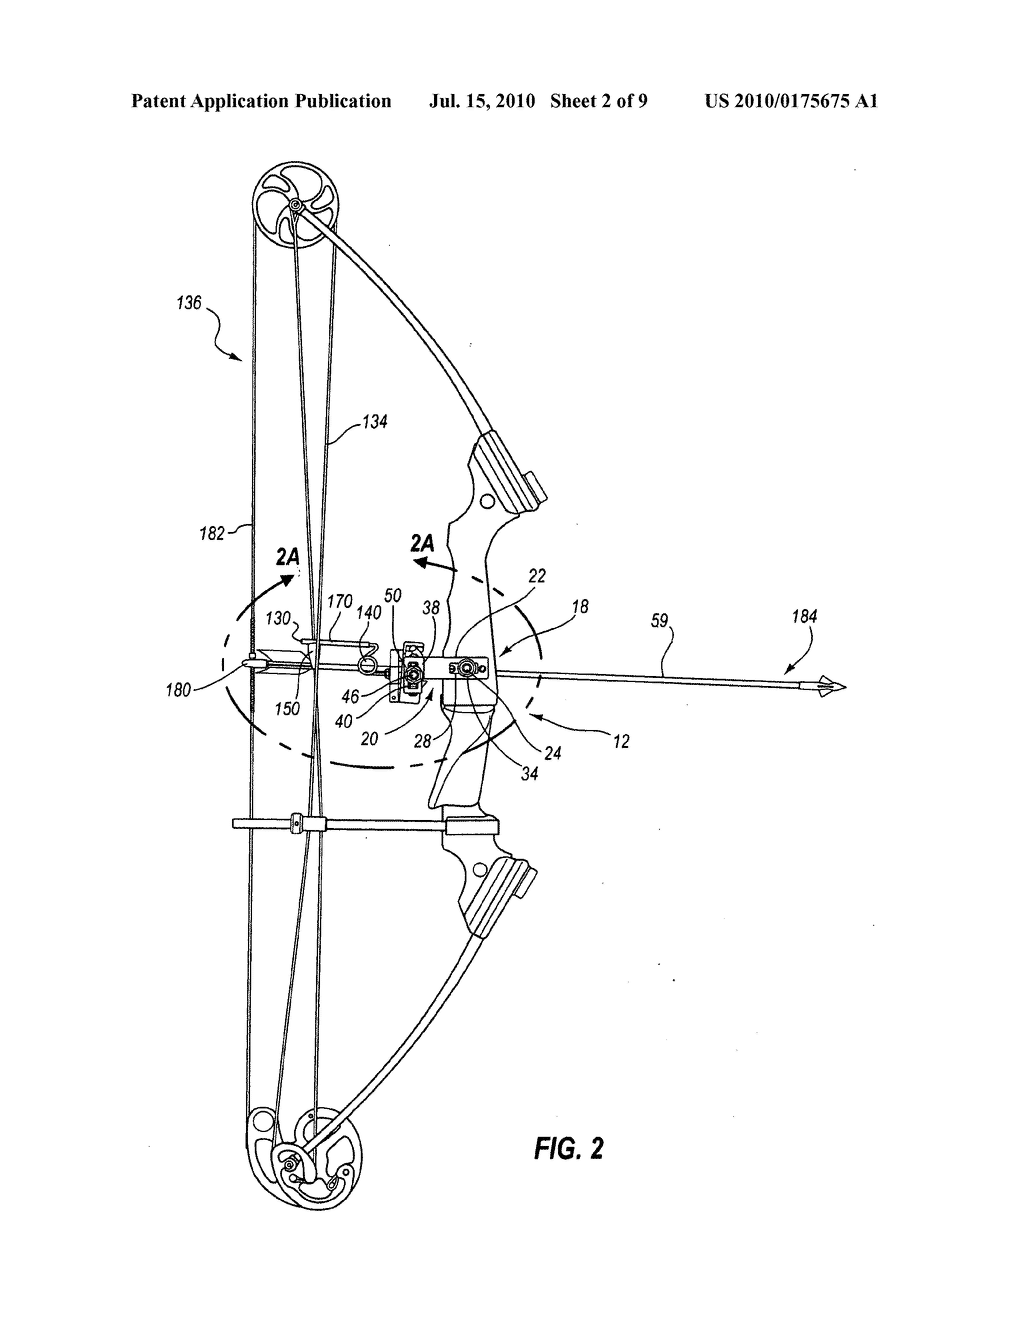 How To String A Compound Bow Zugavu78